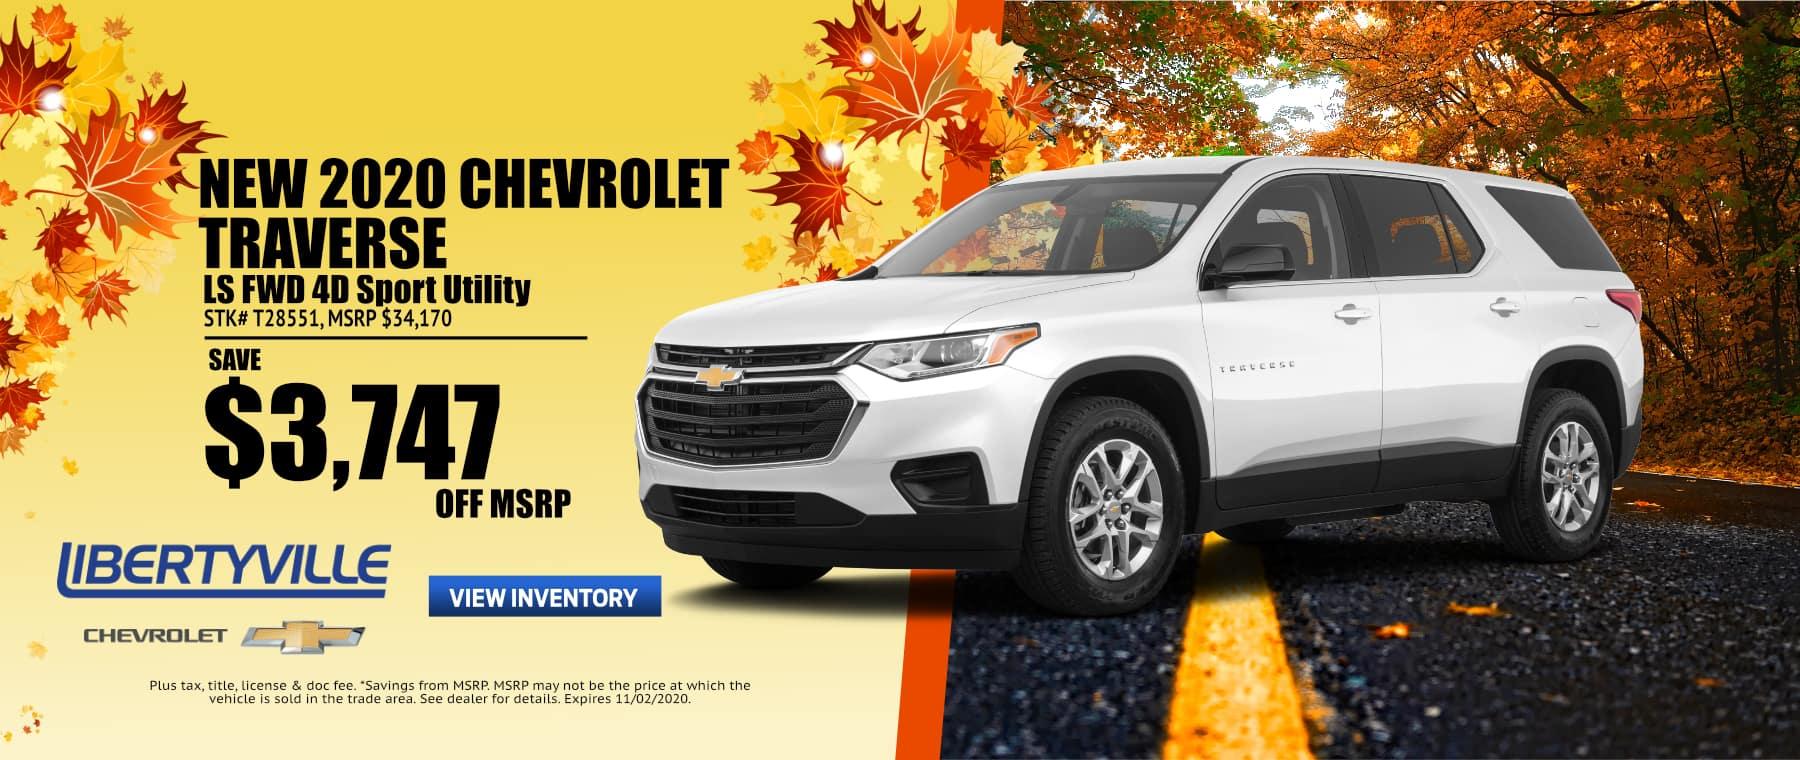 October-2020 Traverse NEW WEBSITE Libertyville